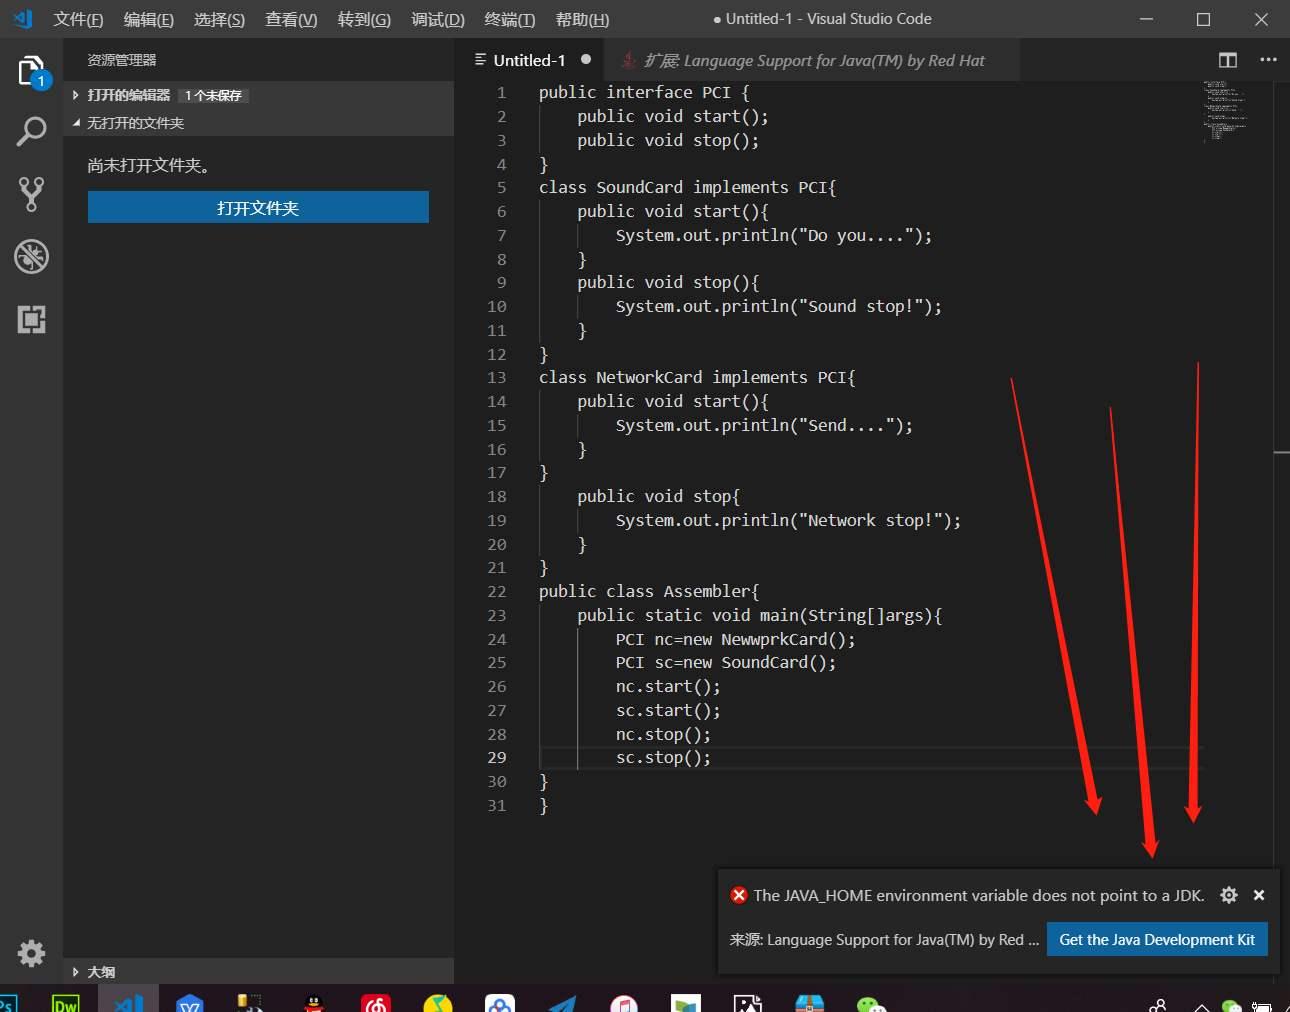 vscode和visualstudio区别-IT技术网站